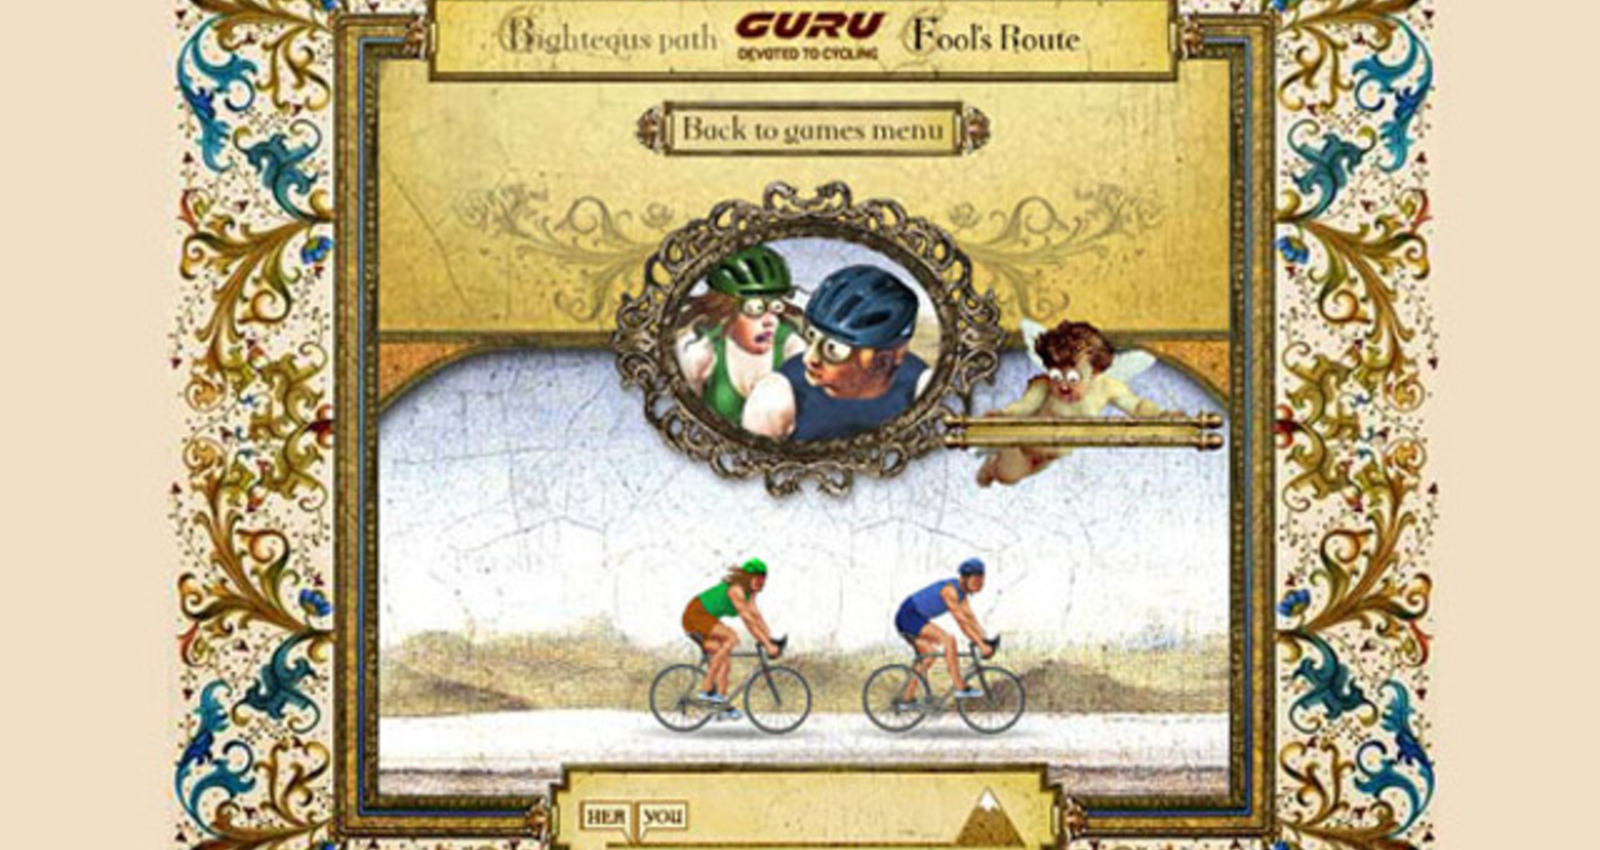 Devoted to Biking